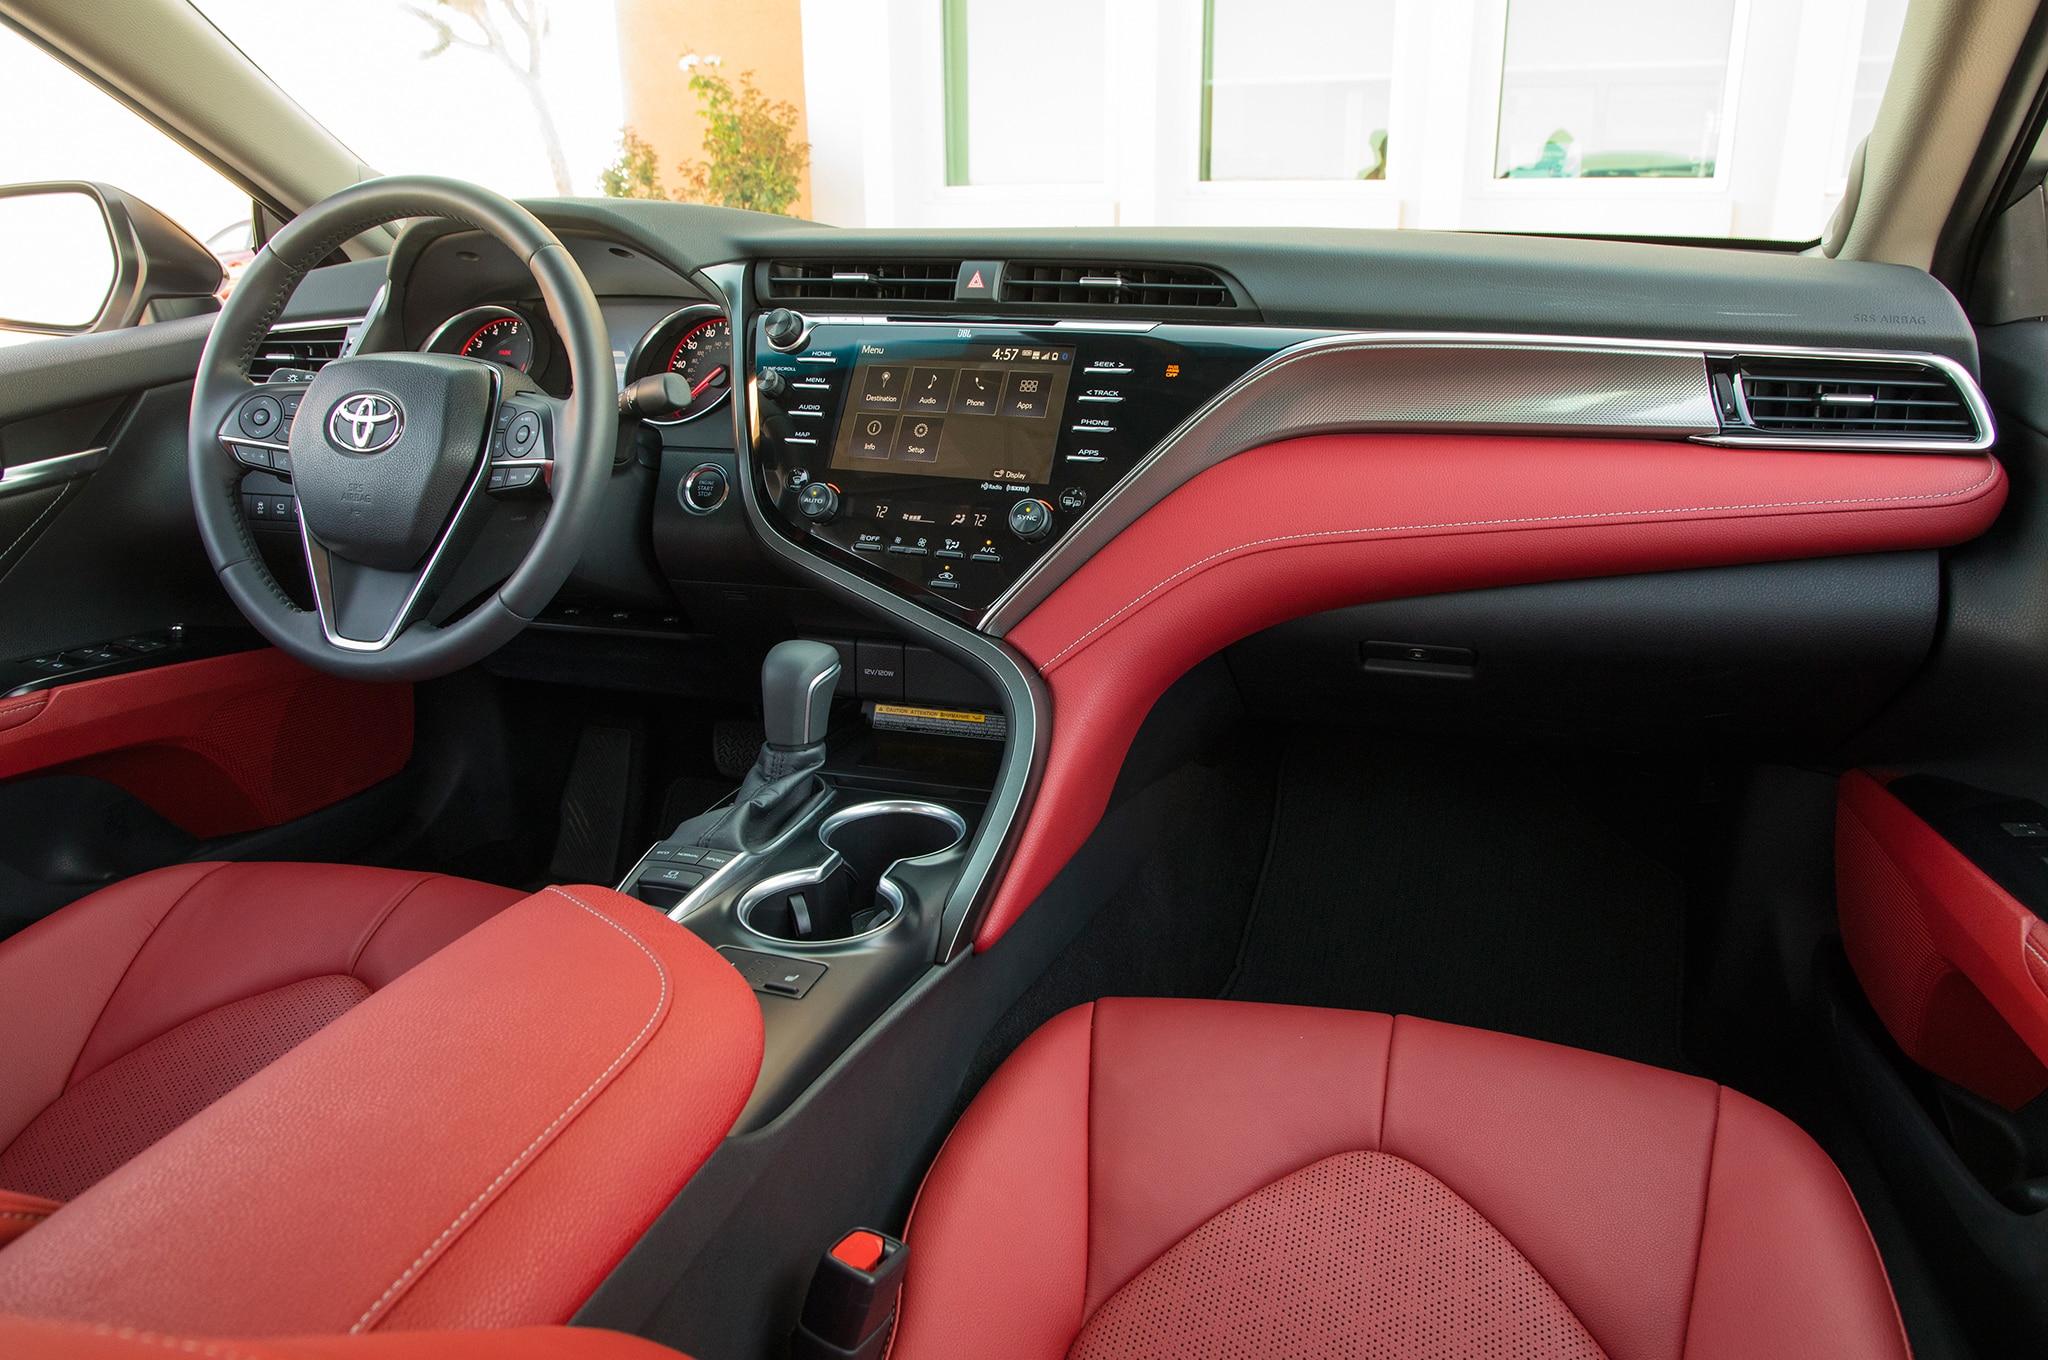 2018 Toyota Camry Xse Front Interior 01 9 Febrero Miguel Cortina